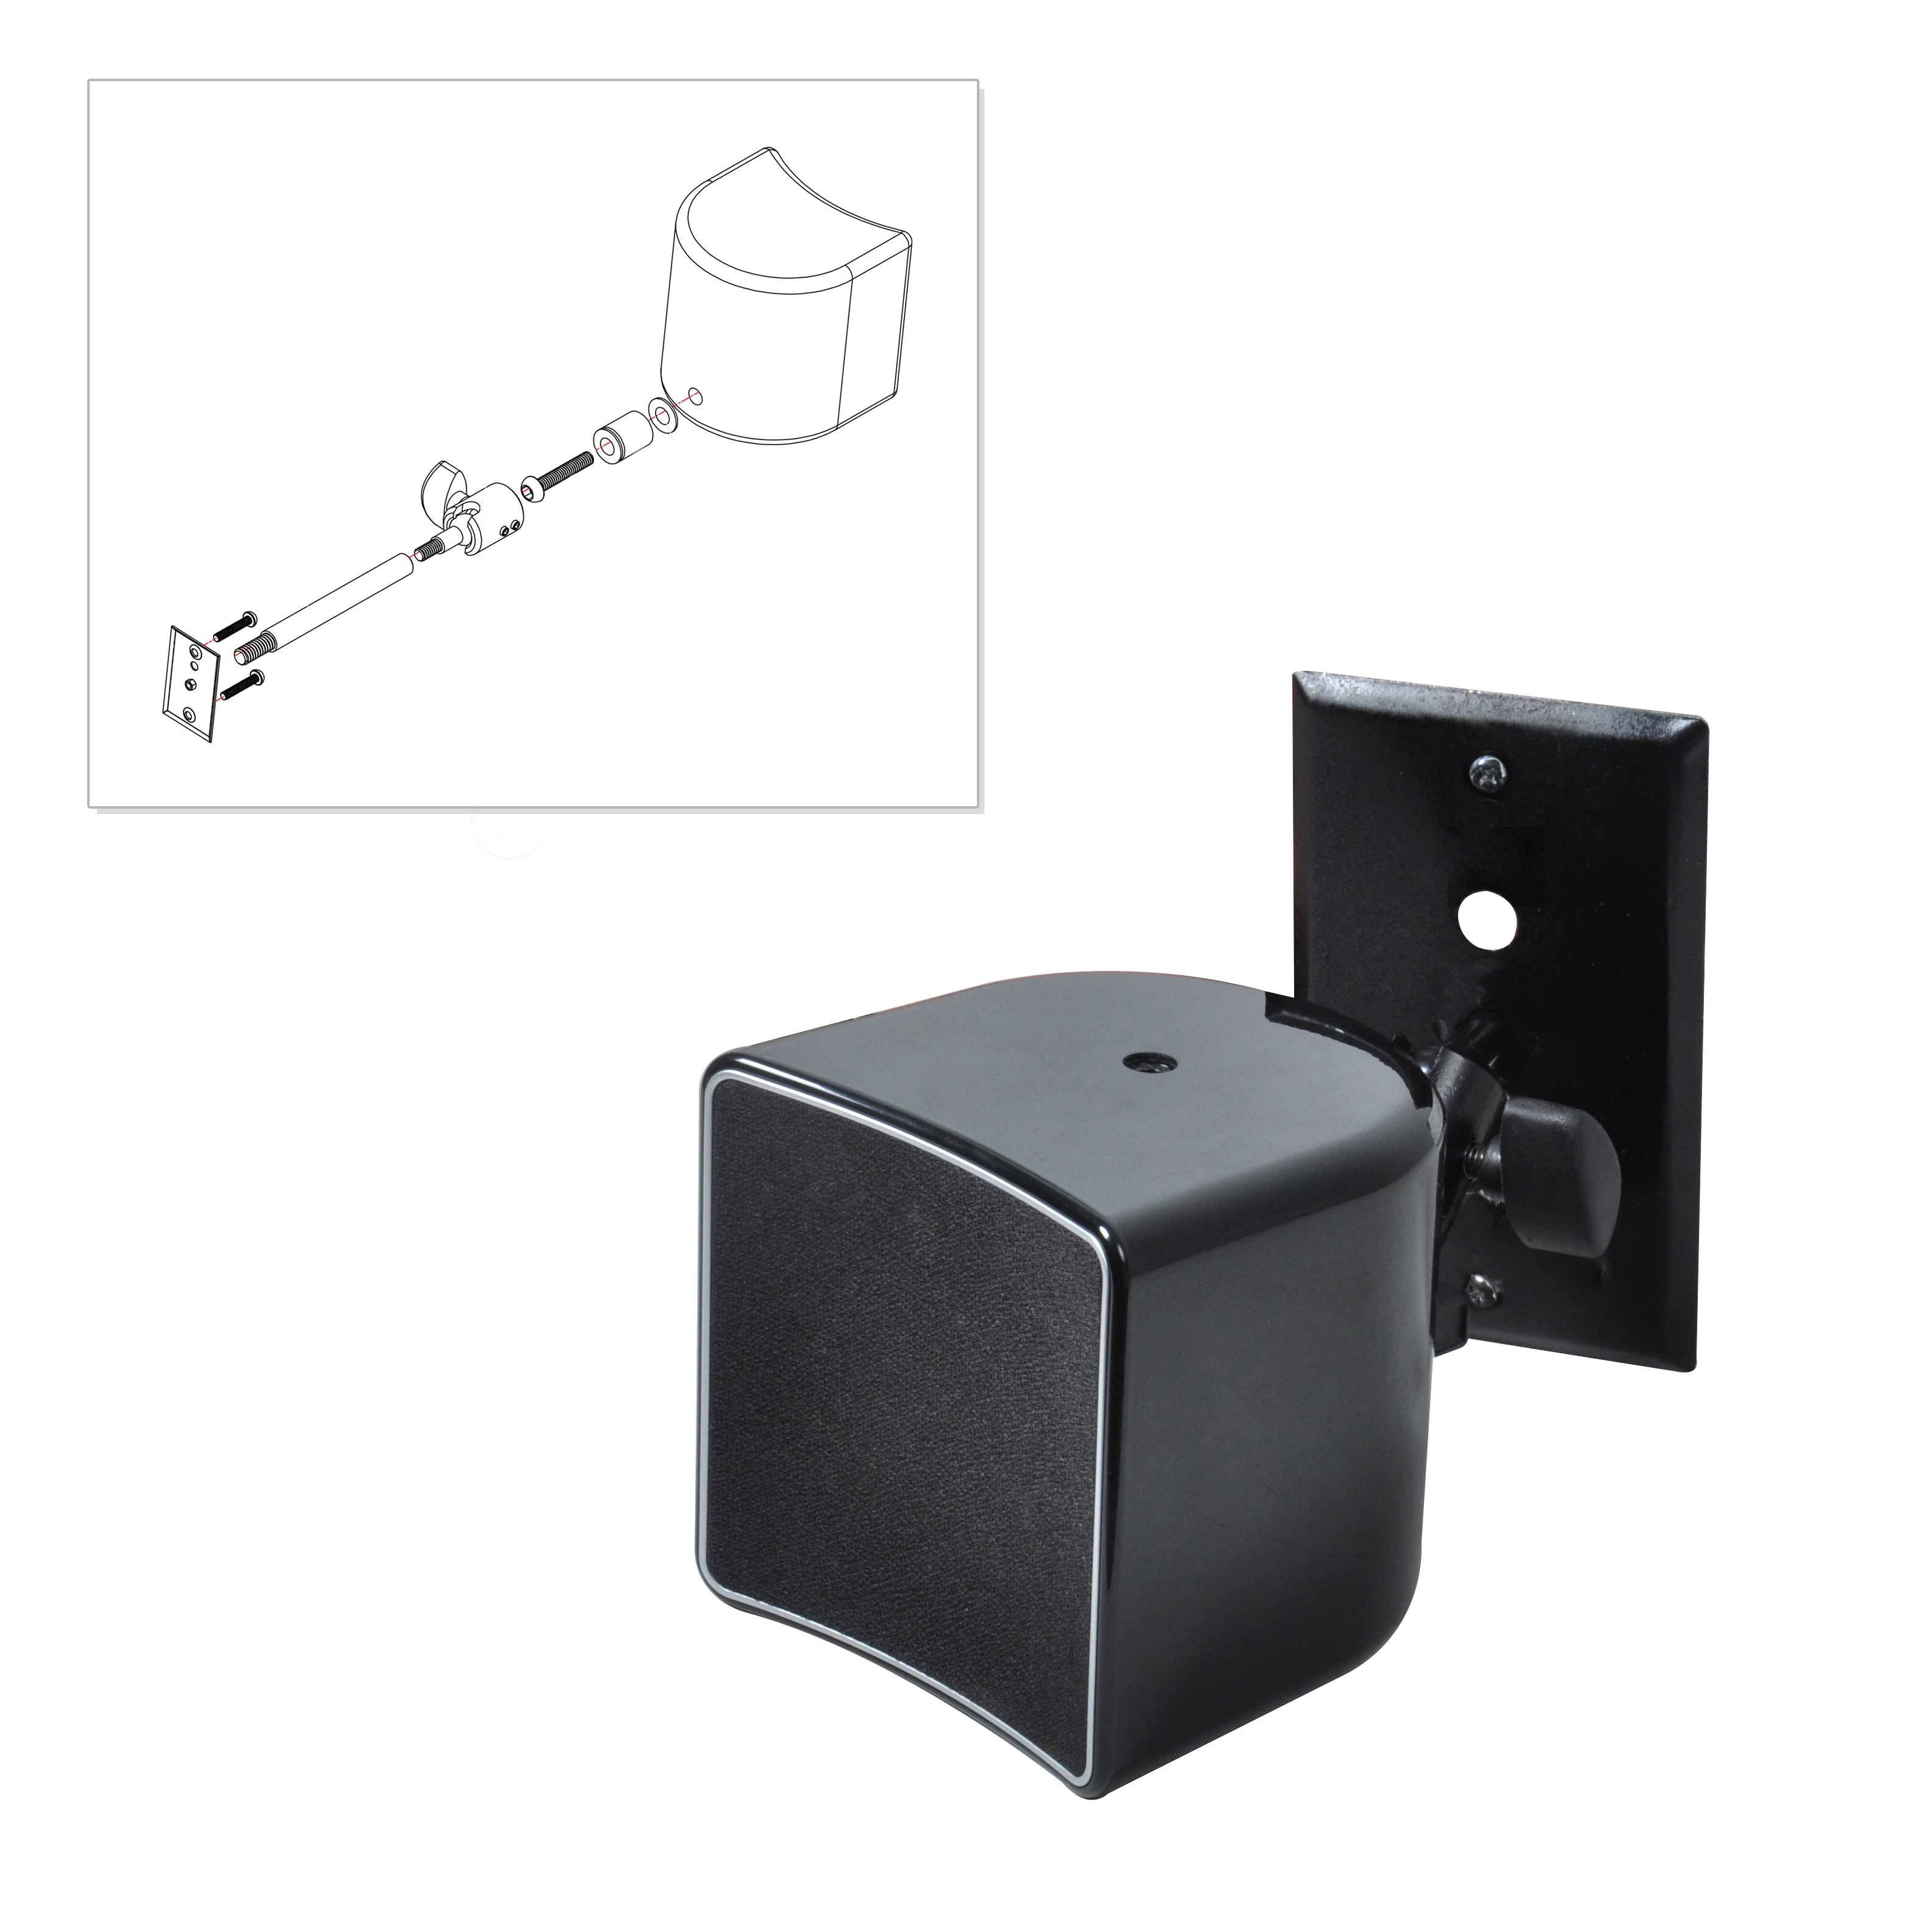 Pyle PSTNDW23 Universal Adjustable Wall Mount Speaker Bracket